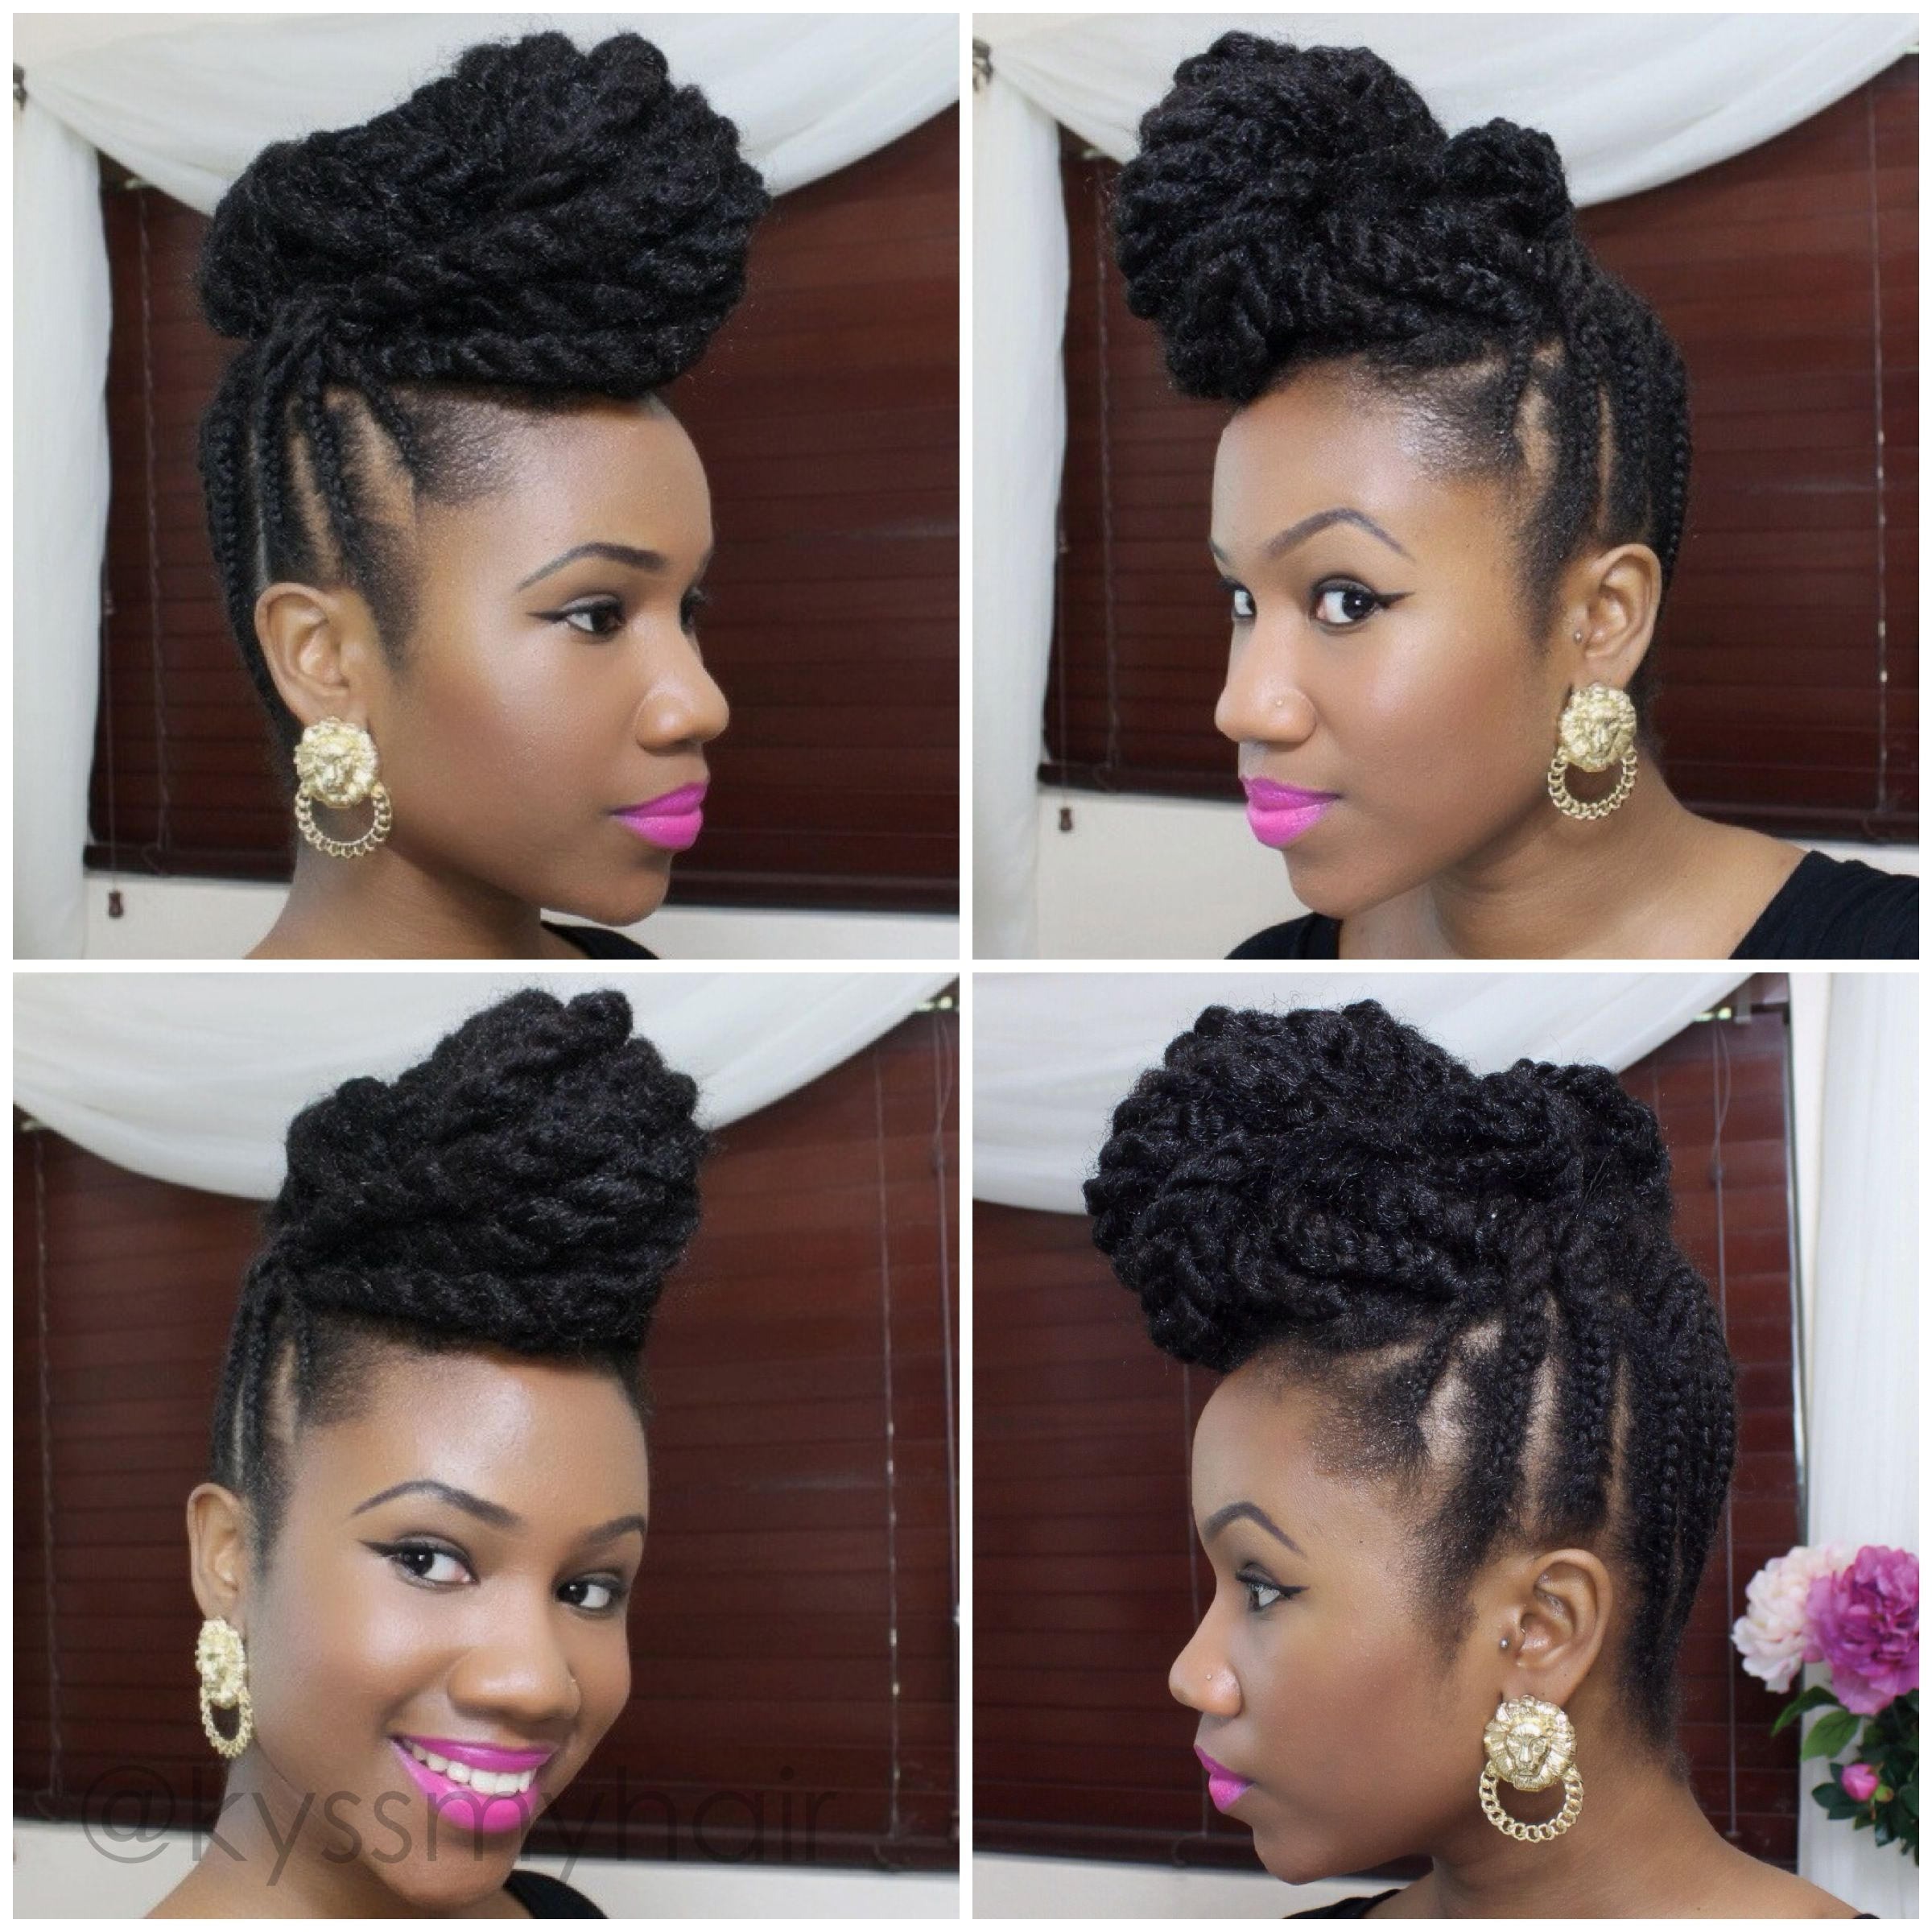 Astounding 1000 Images About Hair Styles On Pinterest Havana Twists Short Hairstyles For Black Women Fulllsitofus